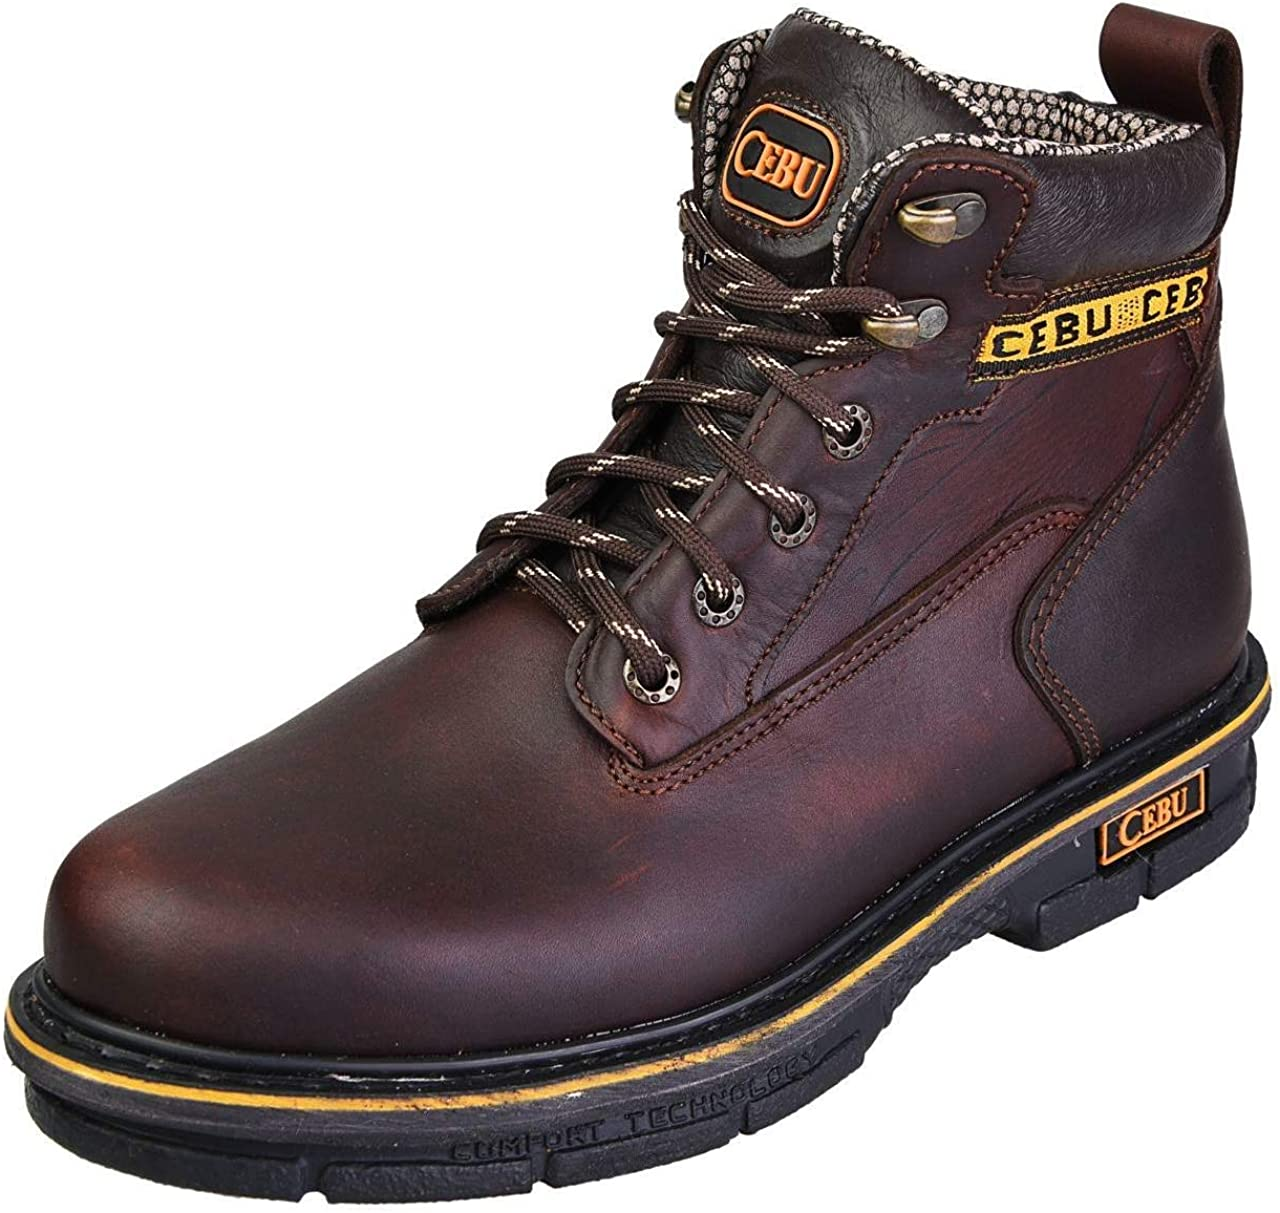 CEBU Men's Soft Toe Work Boots